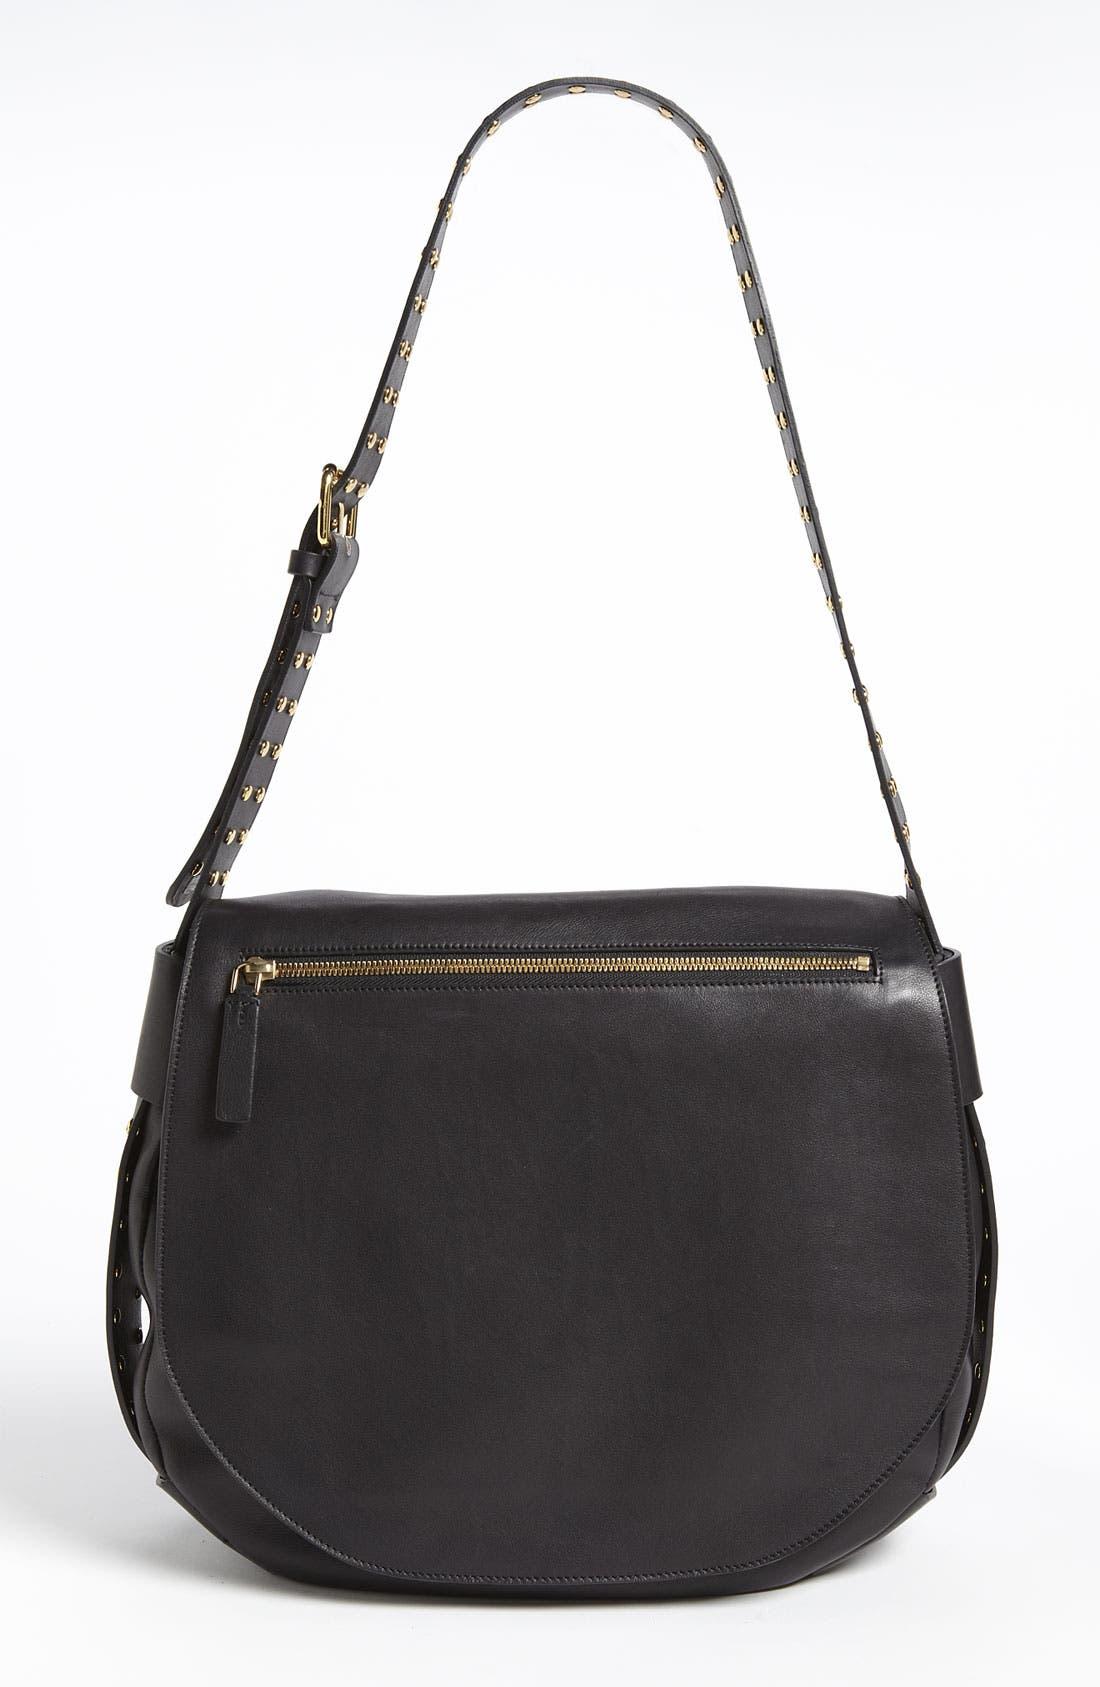 Alternate Image 1 Selected - Marni 'Large' Studded Crossbody Flap Bag